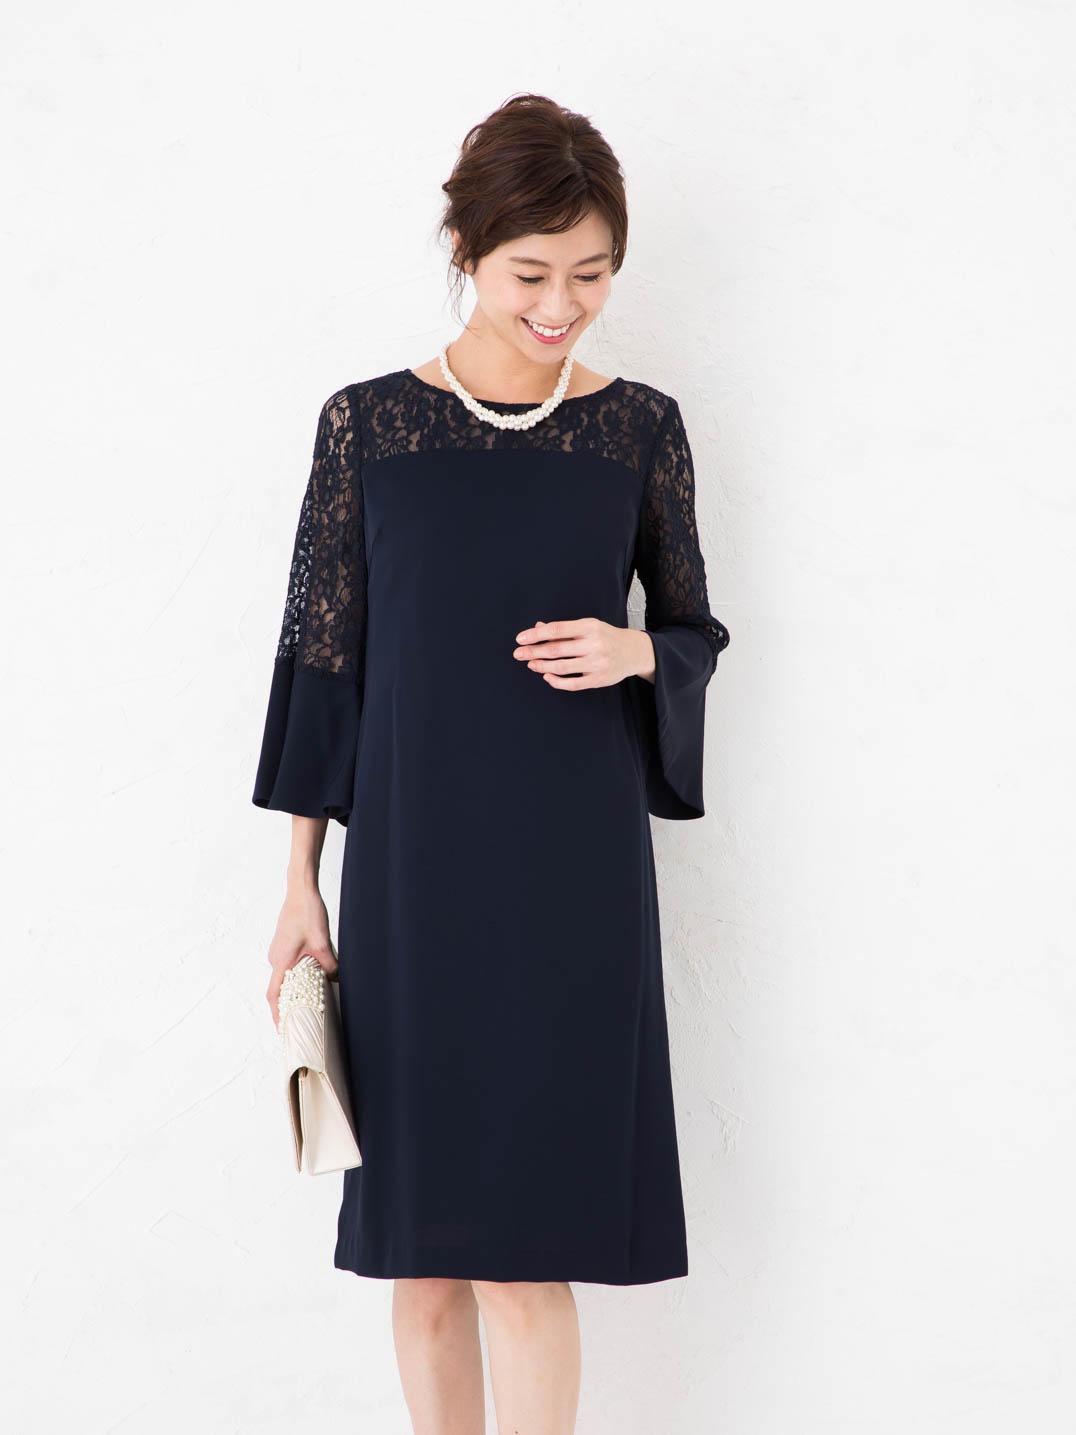 Je super ドレス / Mサイズ (DOC0152)